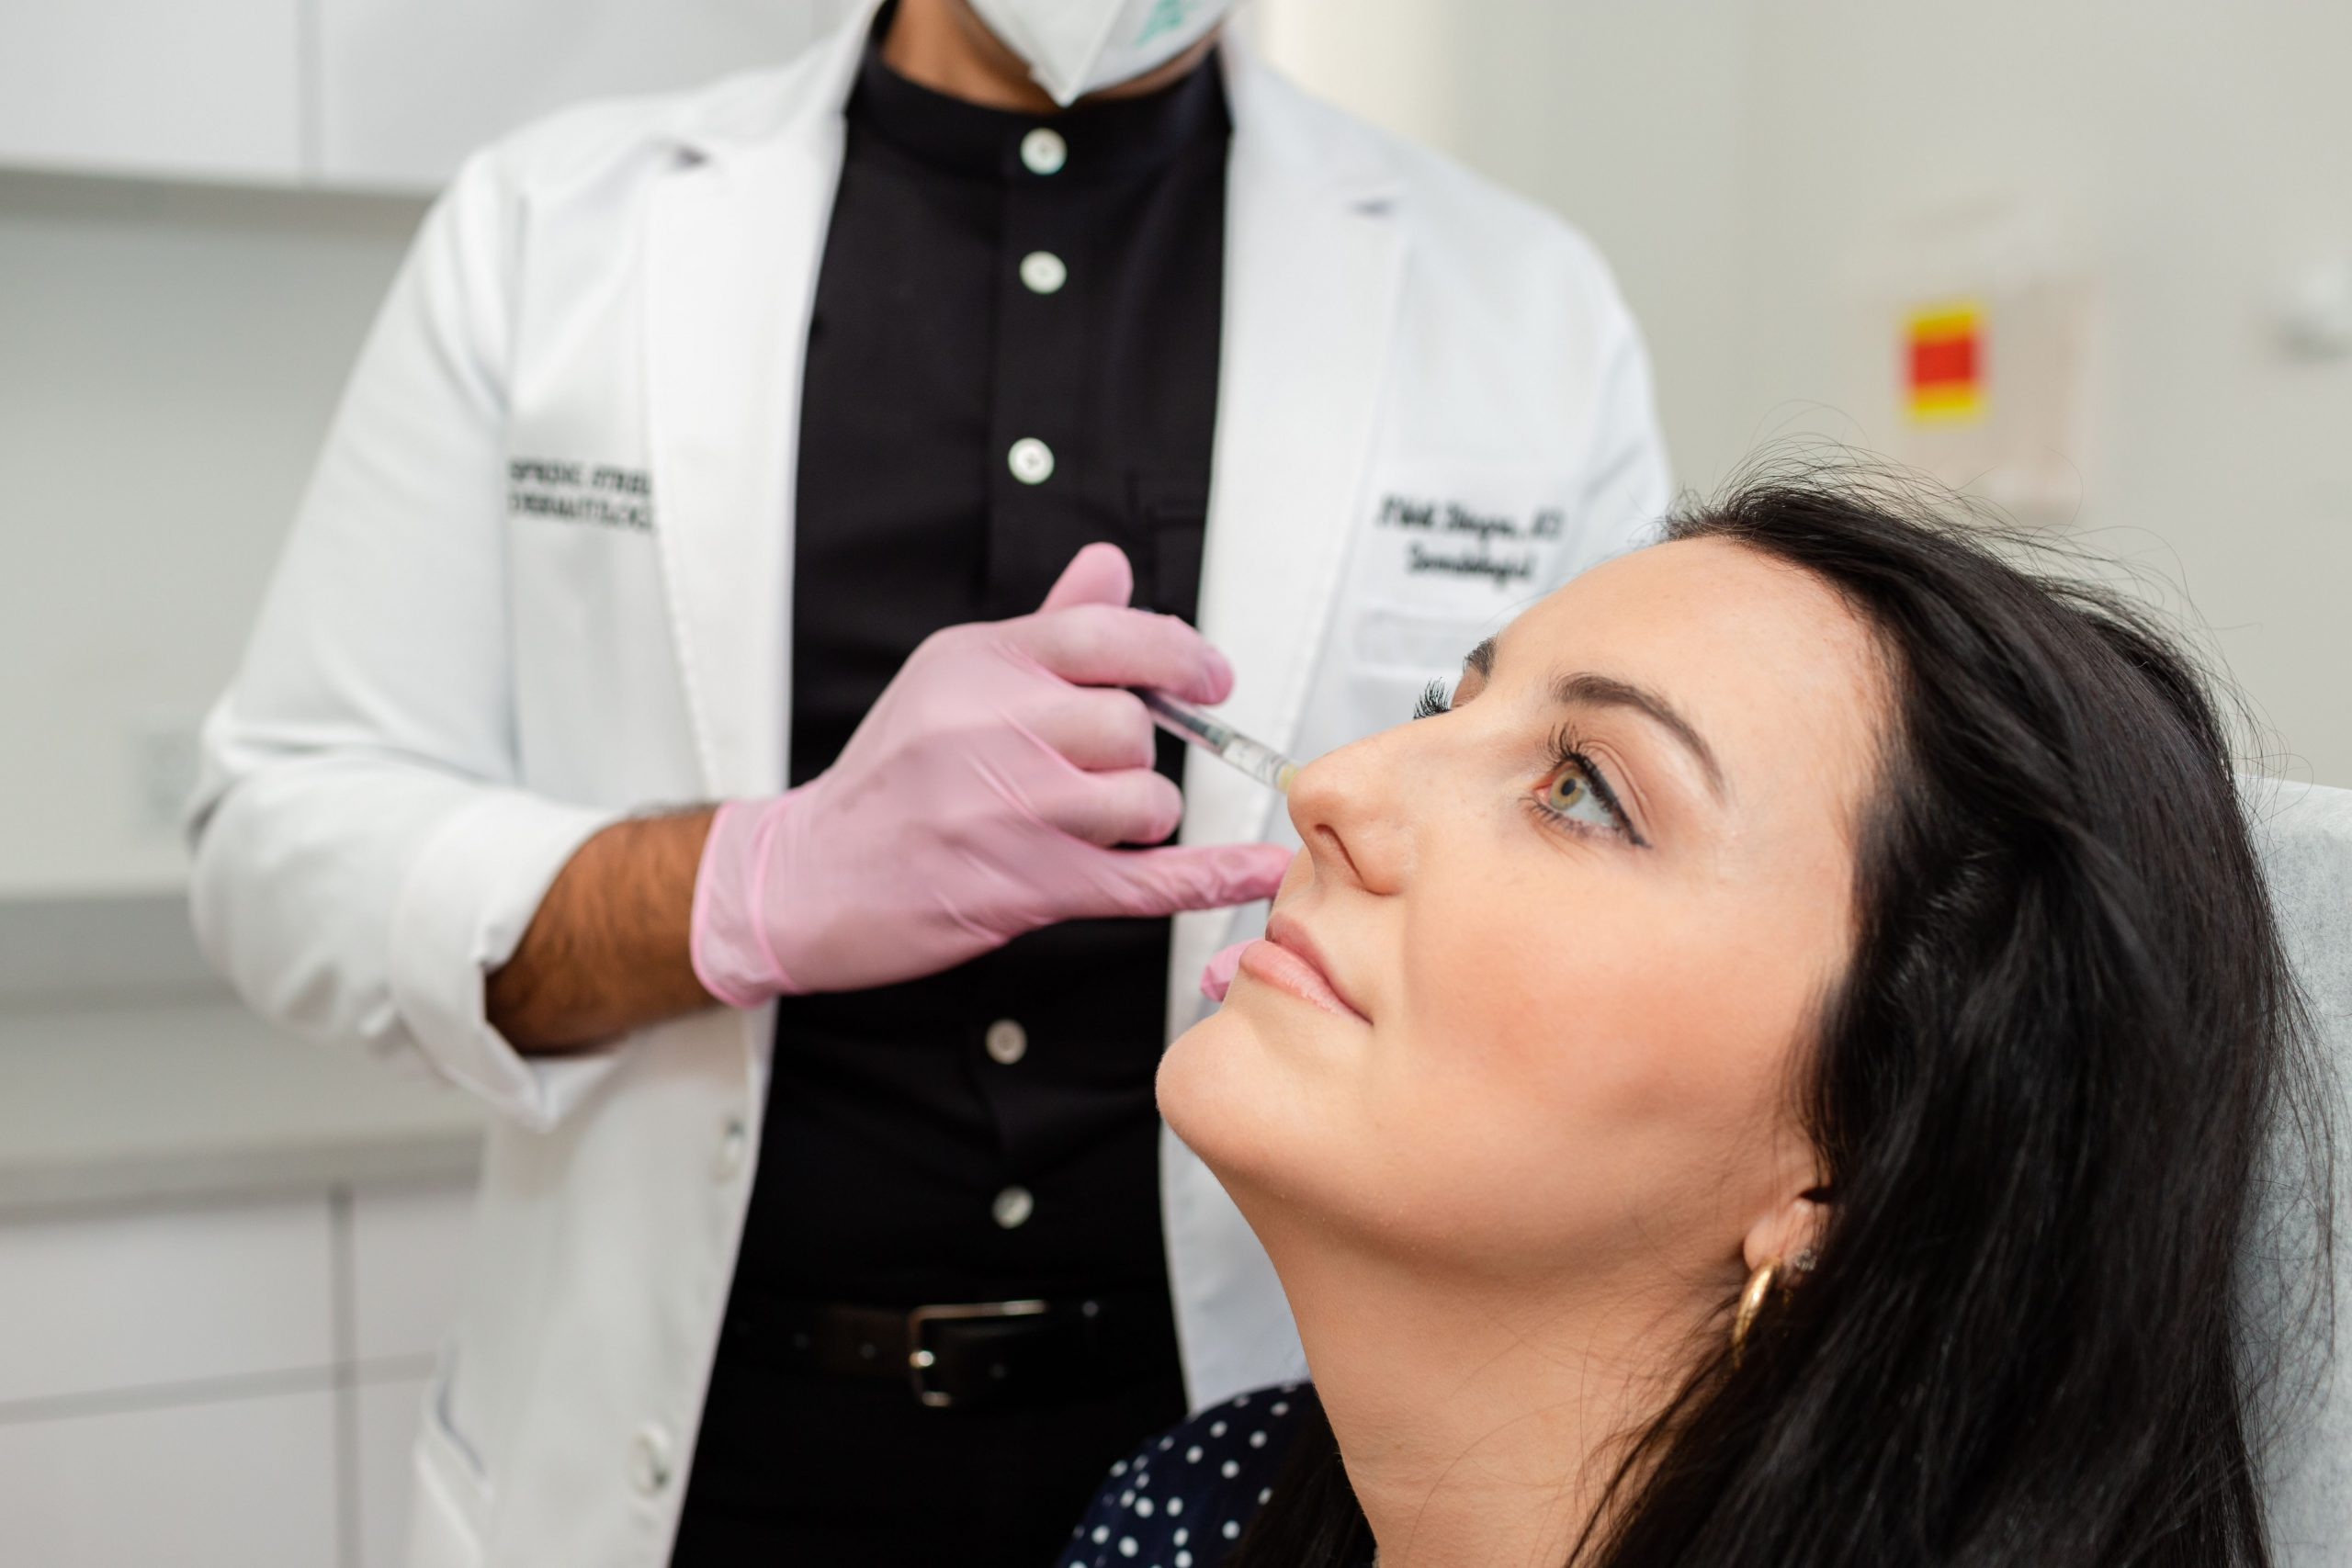 Dermal Fillers to treat wrinkles at Spring Street Dermatology of NYC